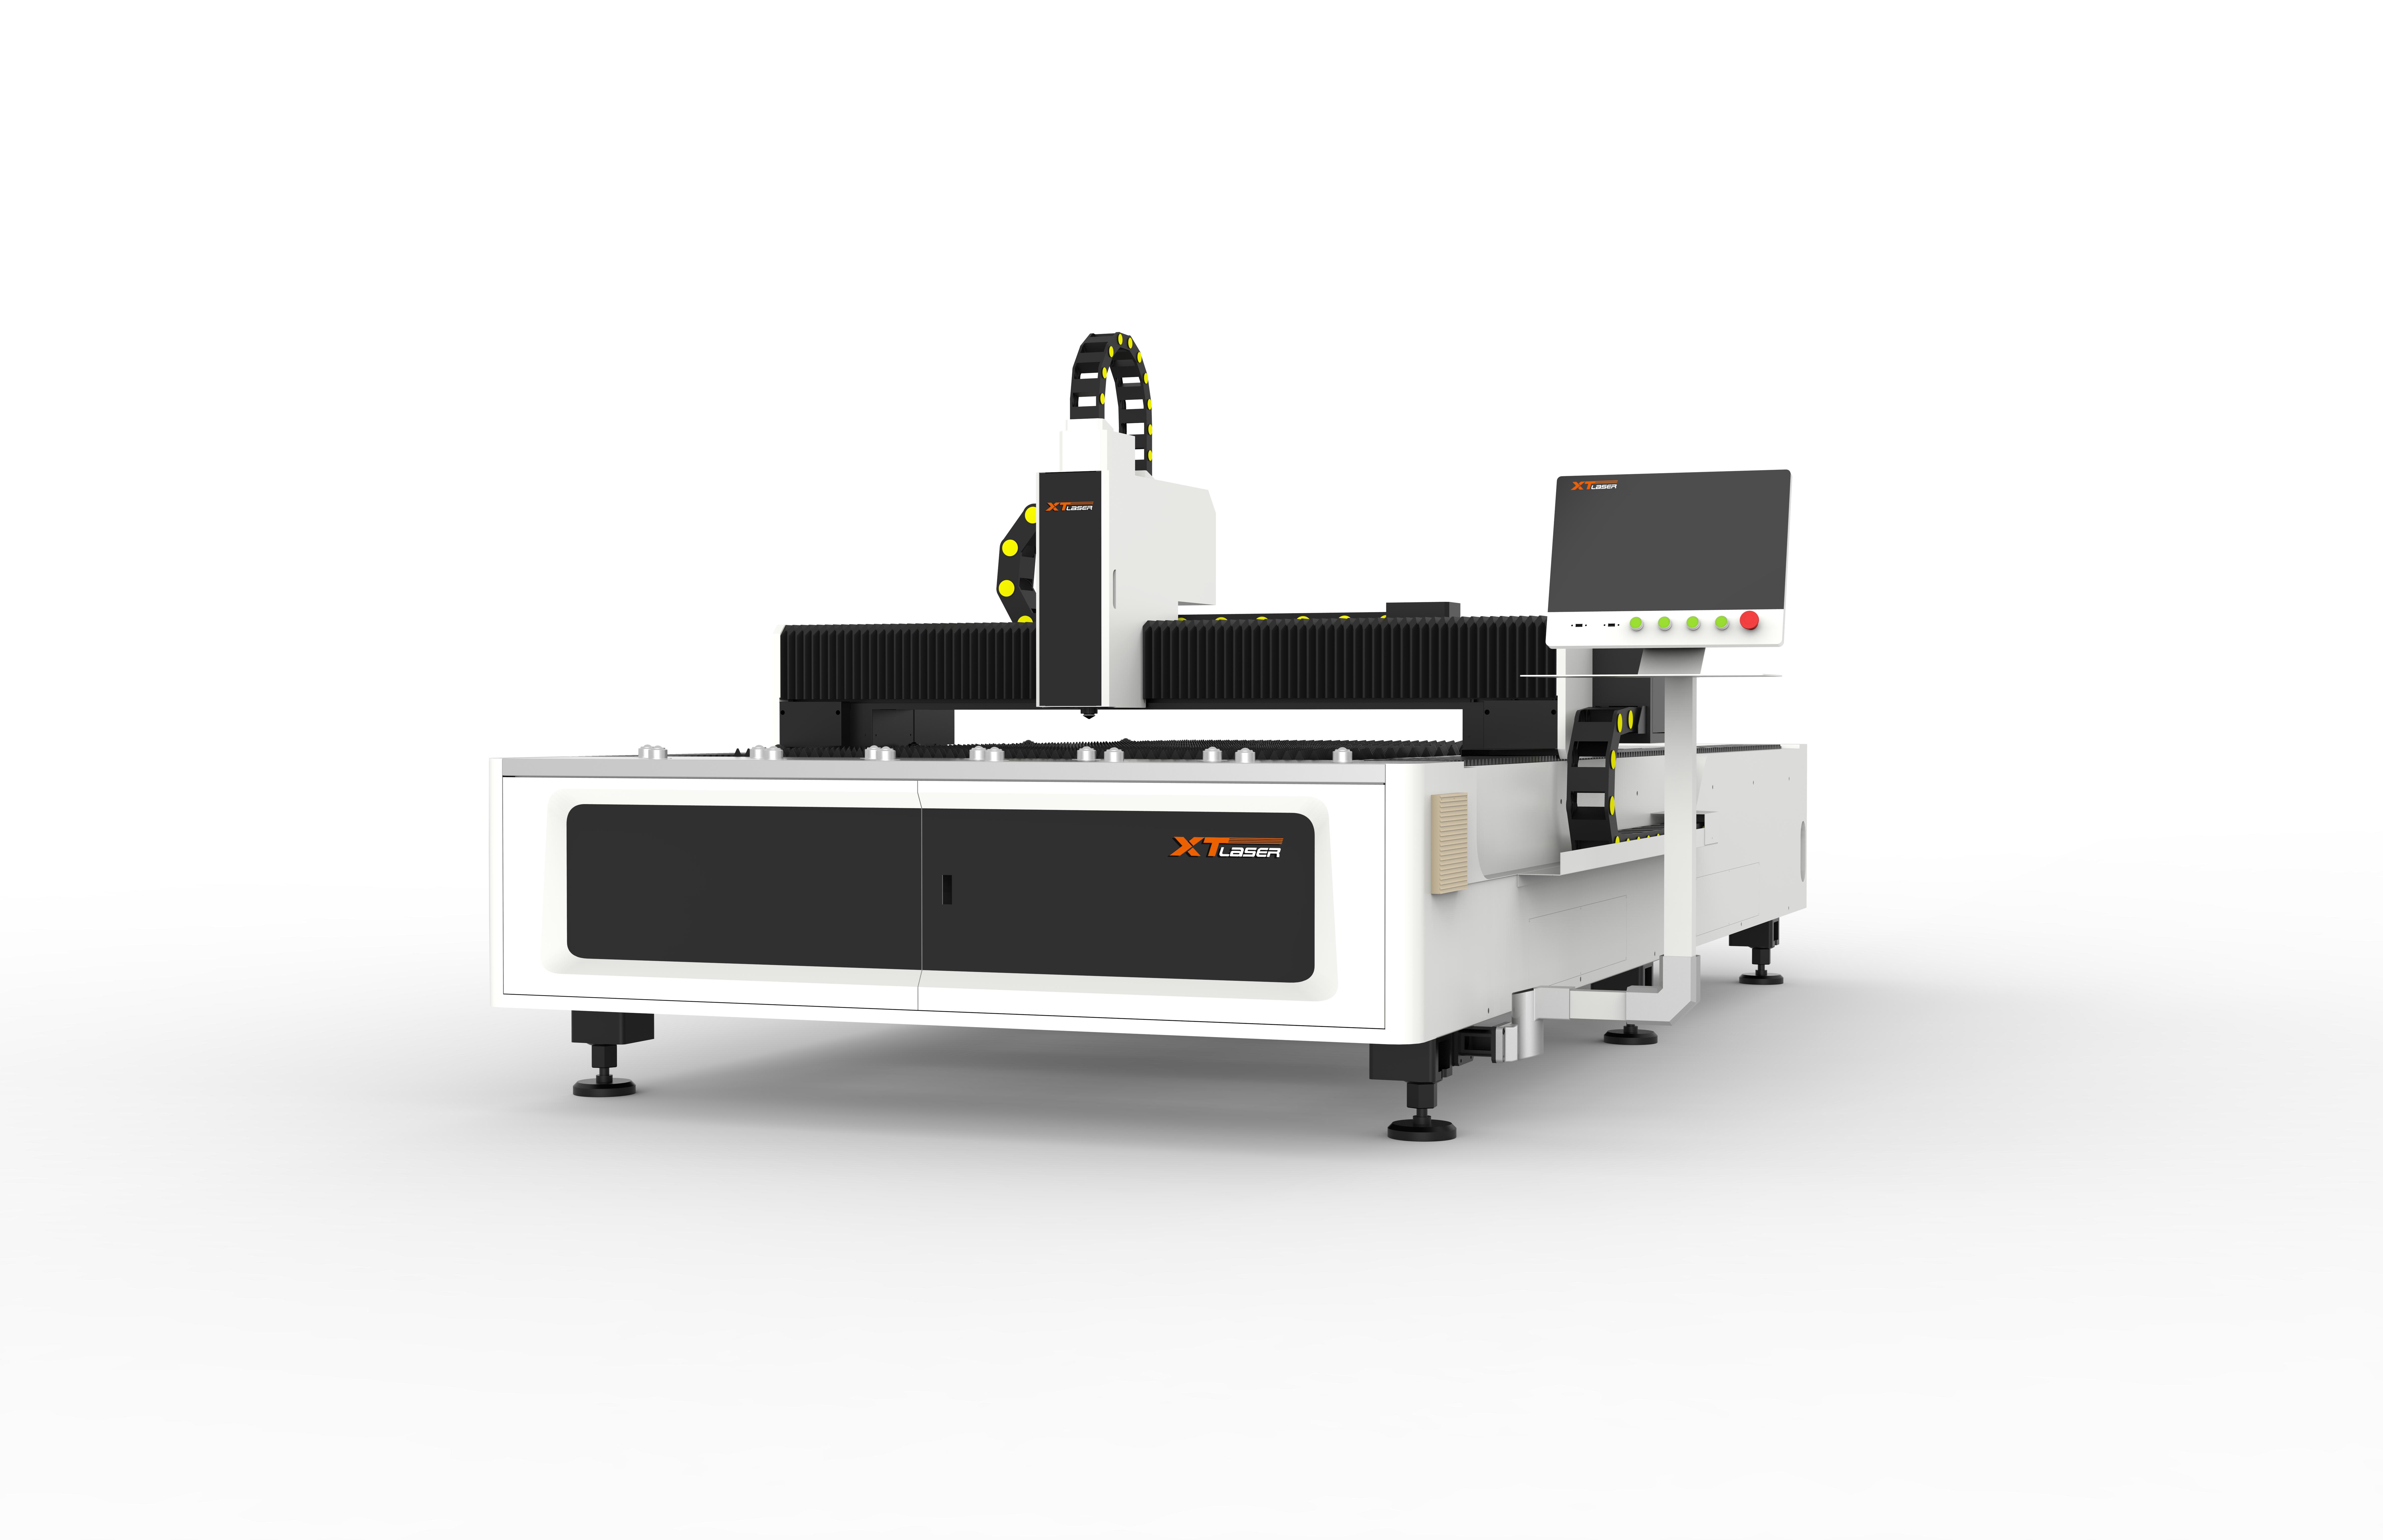 1000w fiber laser cutting machine for cutting galvanized sheet